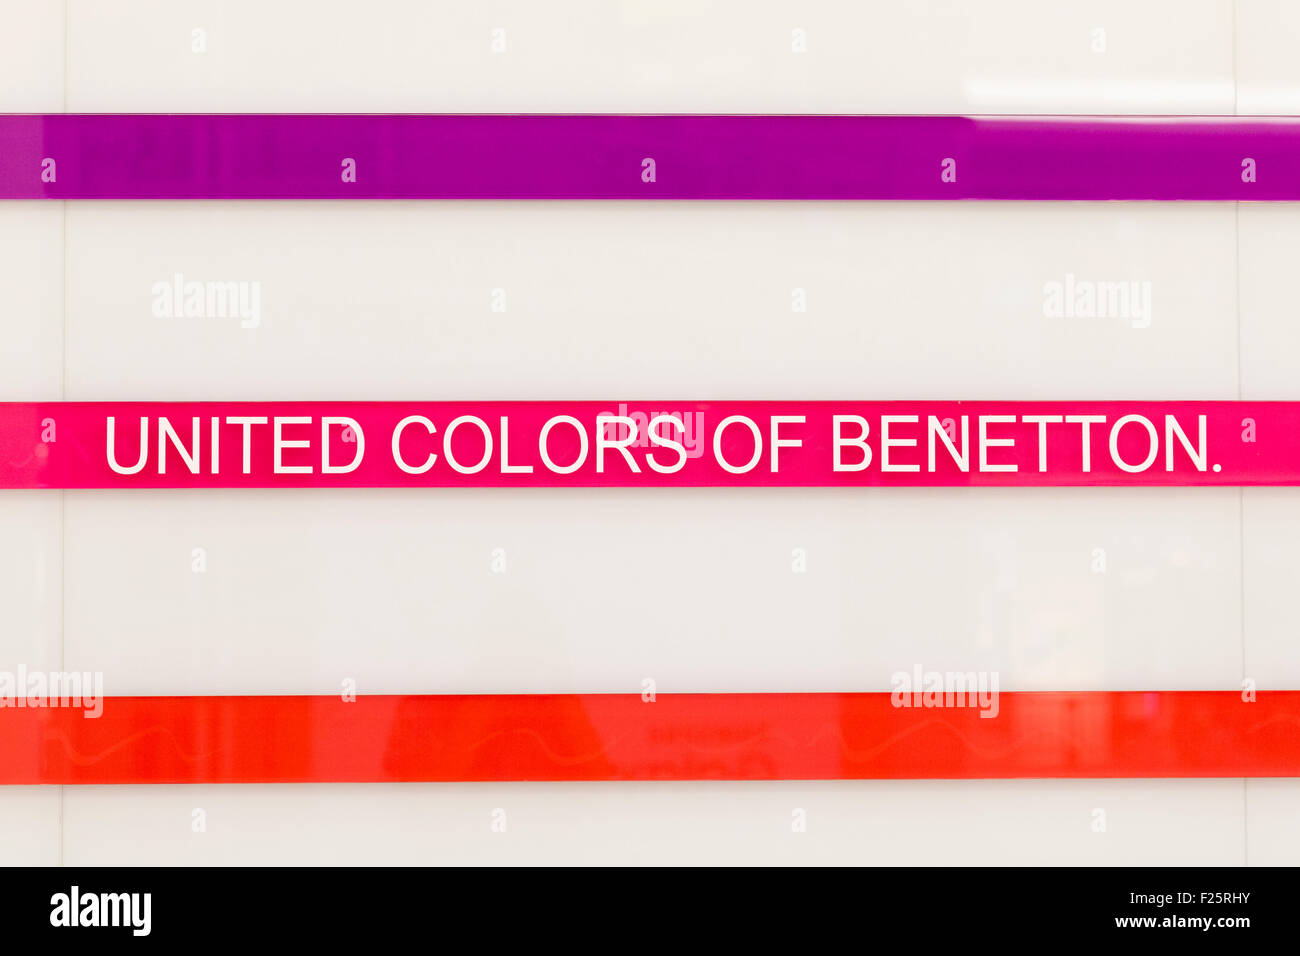 United colors of Benetton logo - Stock Image